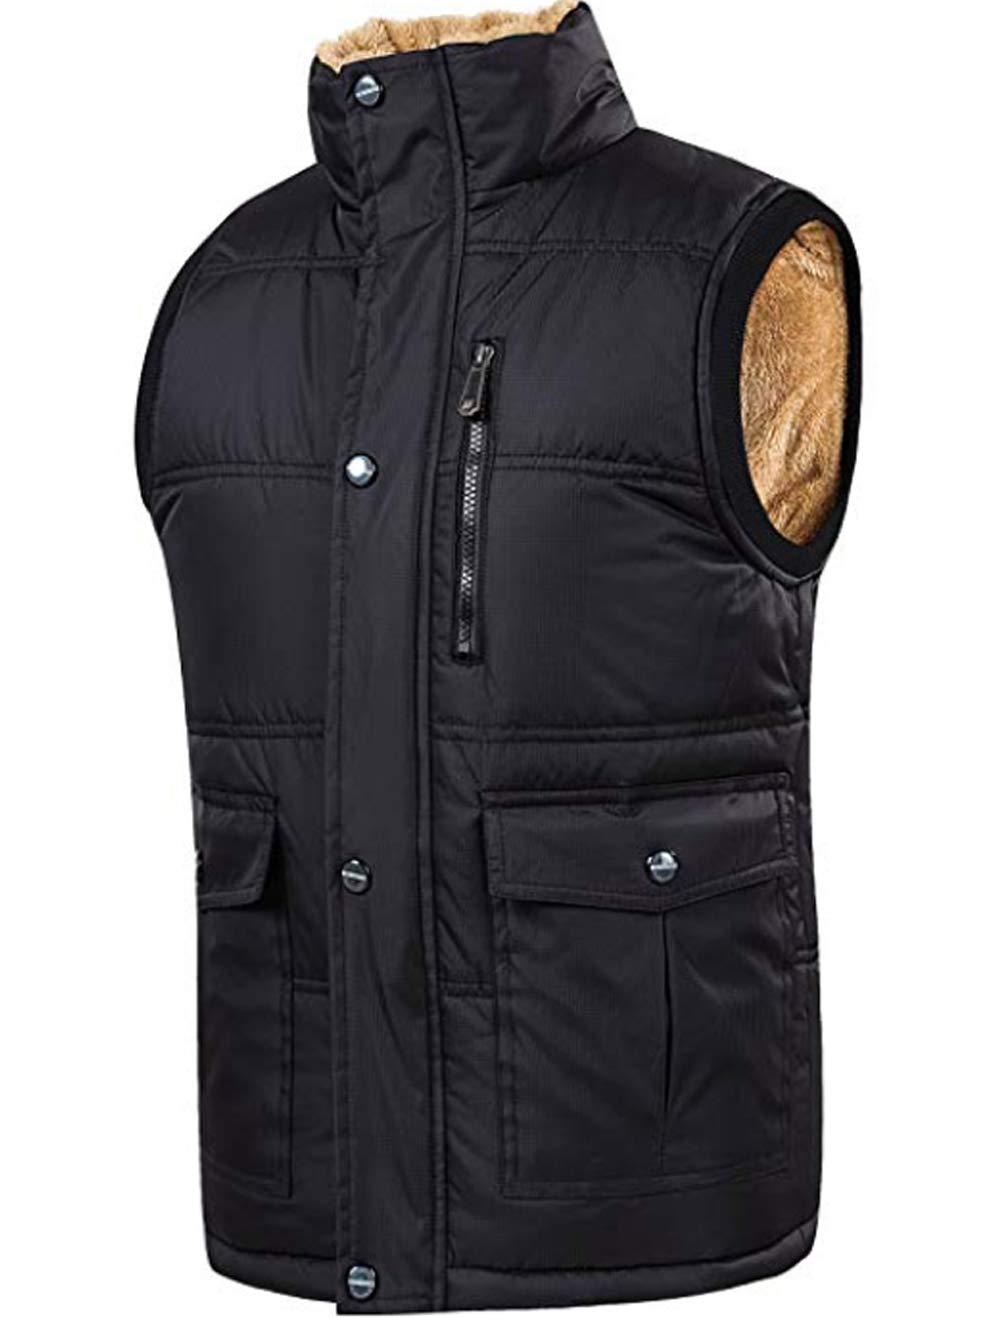 XinYangNi Men's Winter Warm Outdoor Padded Puffer Lightweight Vest Thick Fleece Lined Sleeveless Jacket Black US 3XL /Asia 7XL by XinYangNi